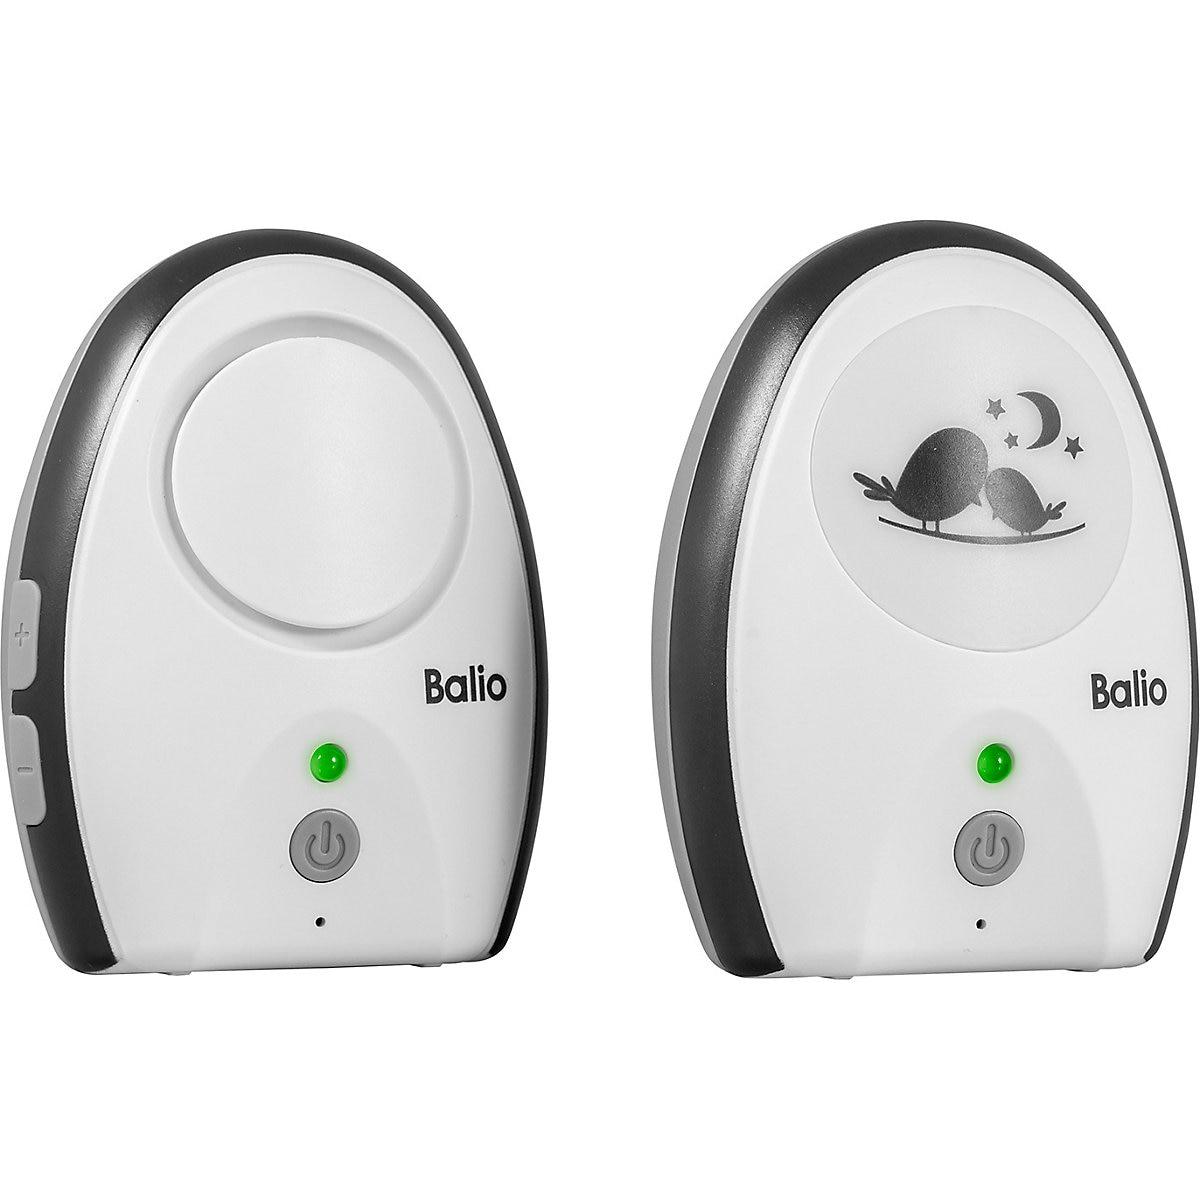 Baby Sleeping Monitors BALIO 4361097 Safety baby monitor control for children радио и видеоняни balio balio mb 03